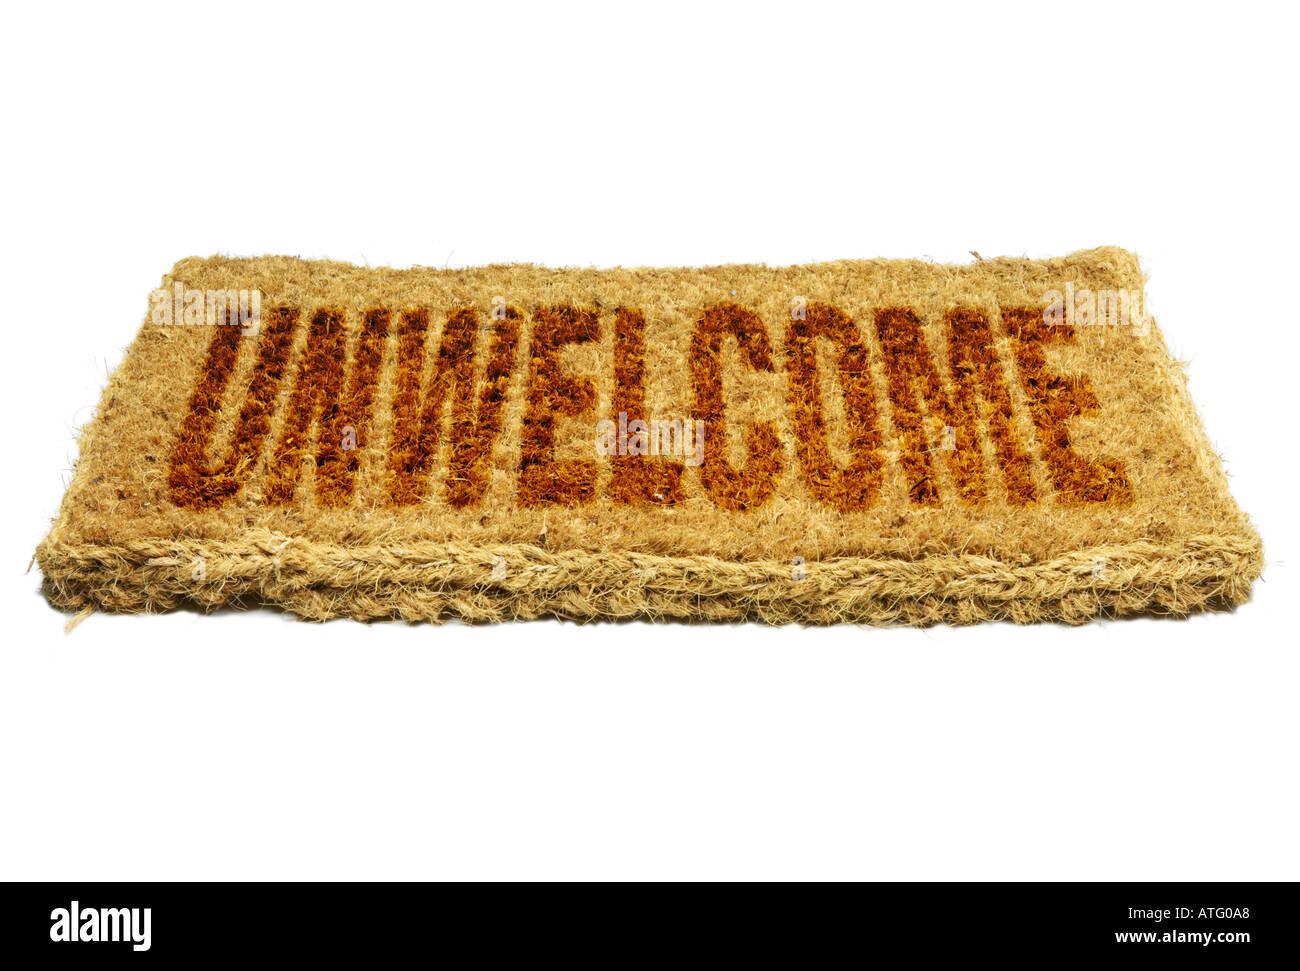 Kokosfasern willkommene Matte unwillkommene Konzept Stockbild